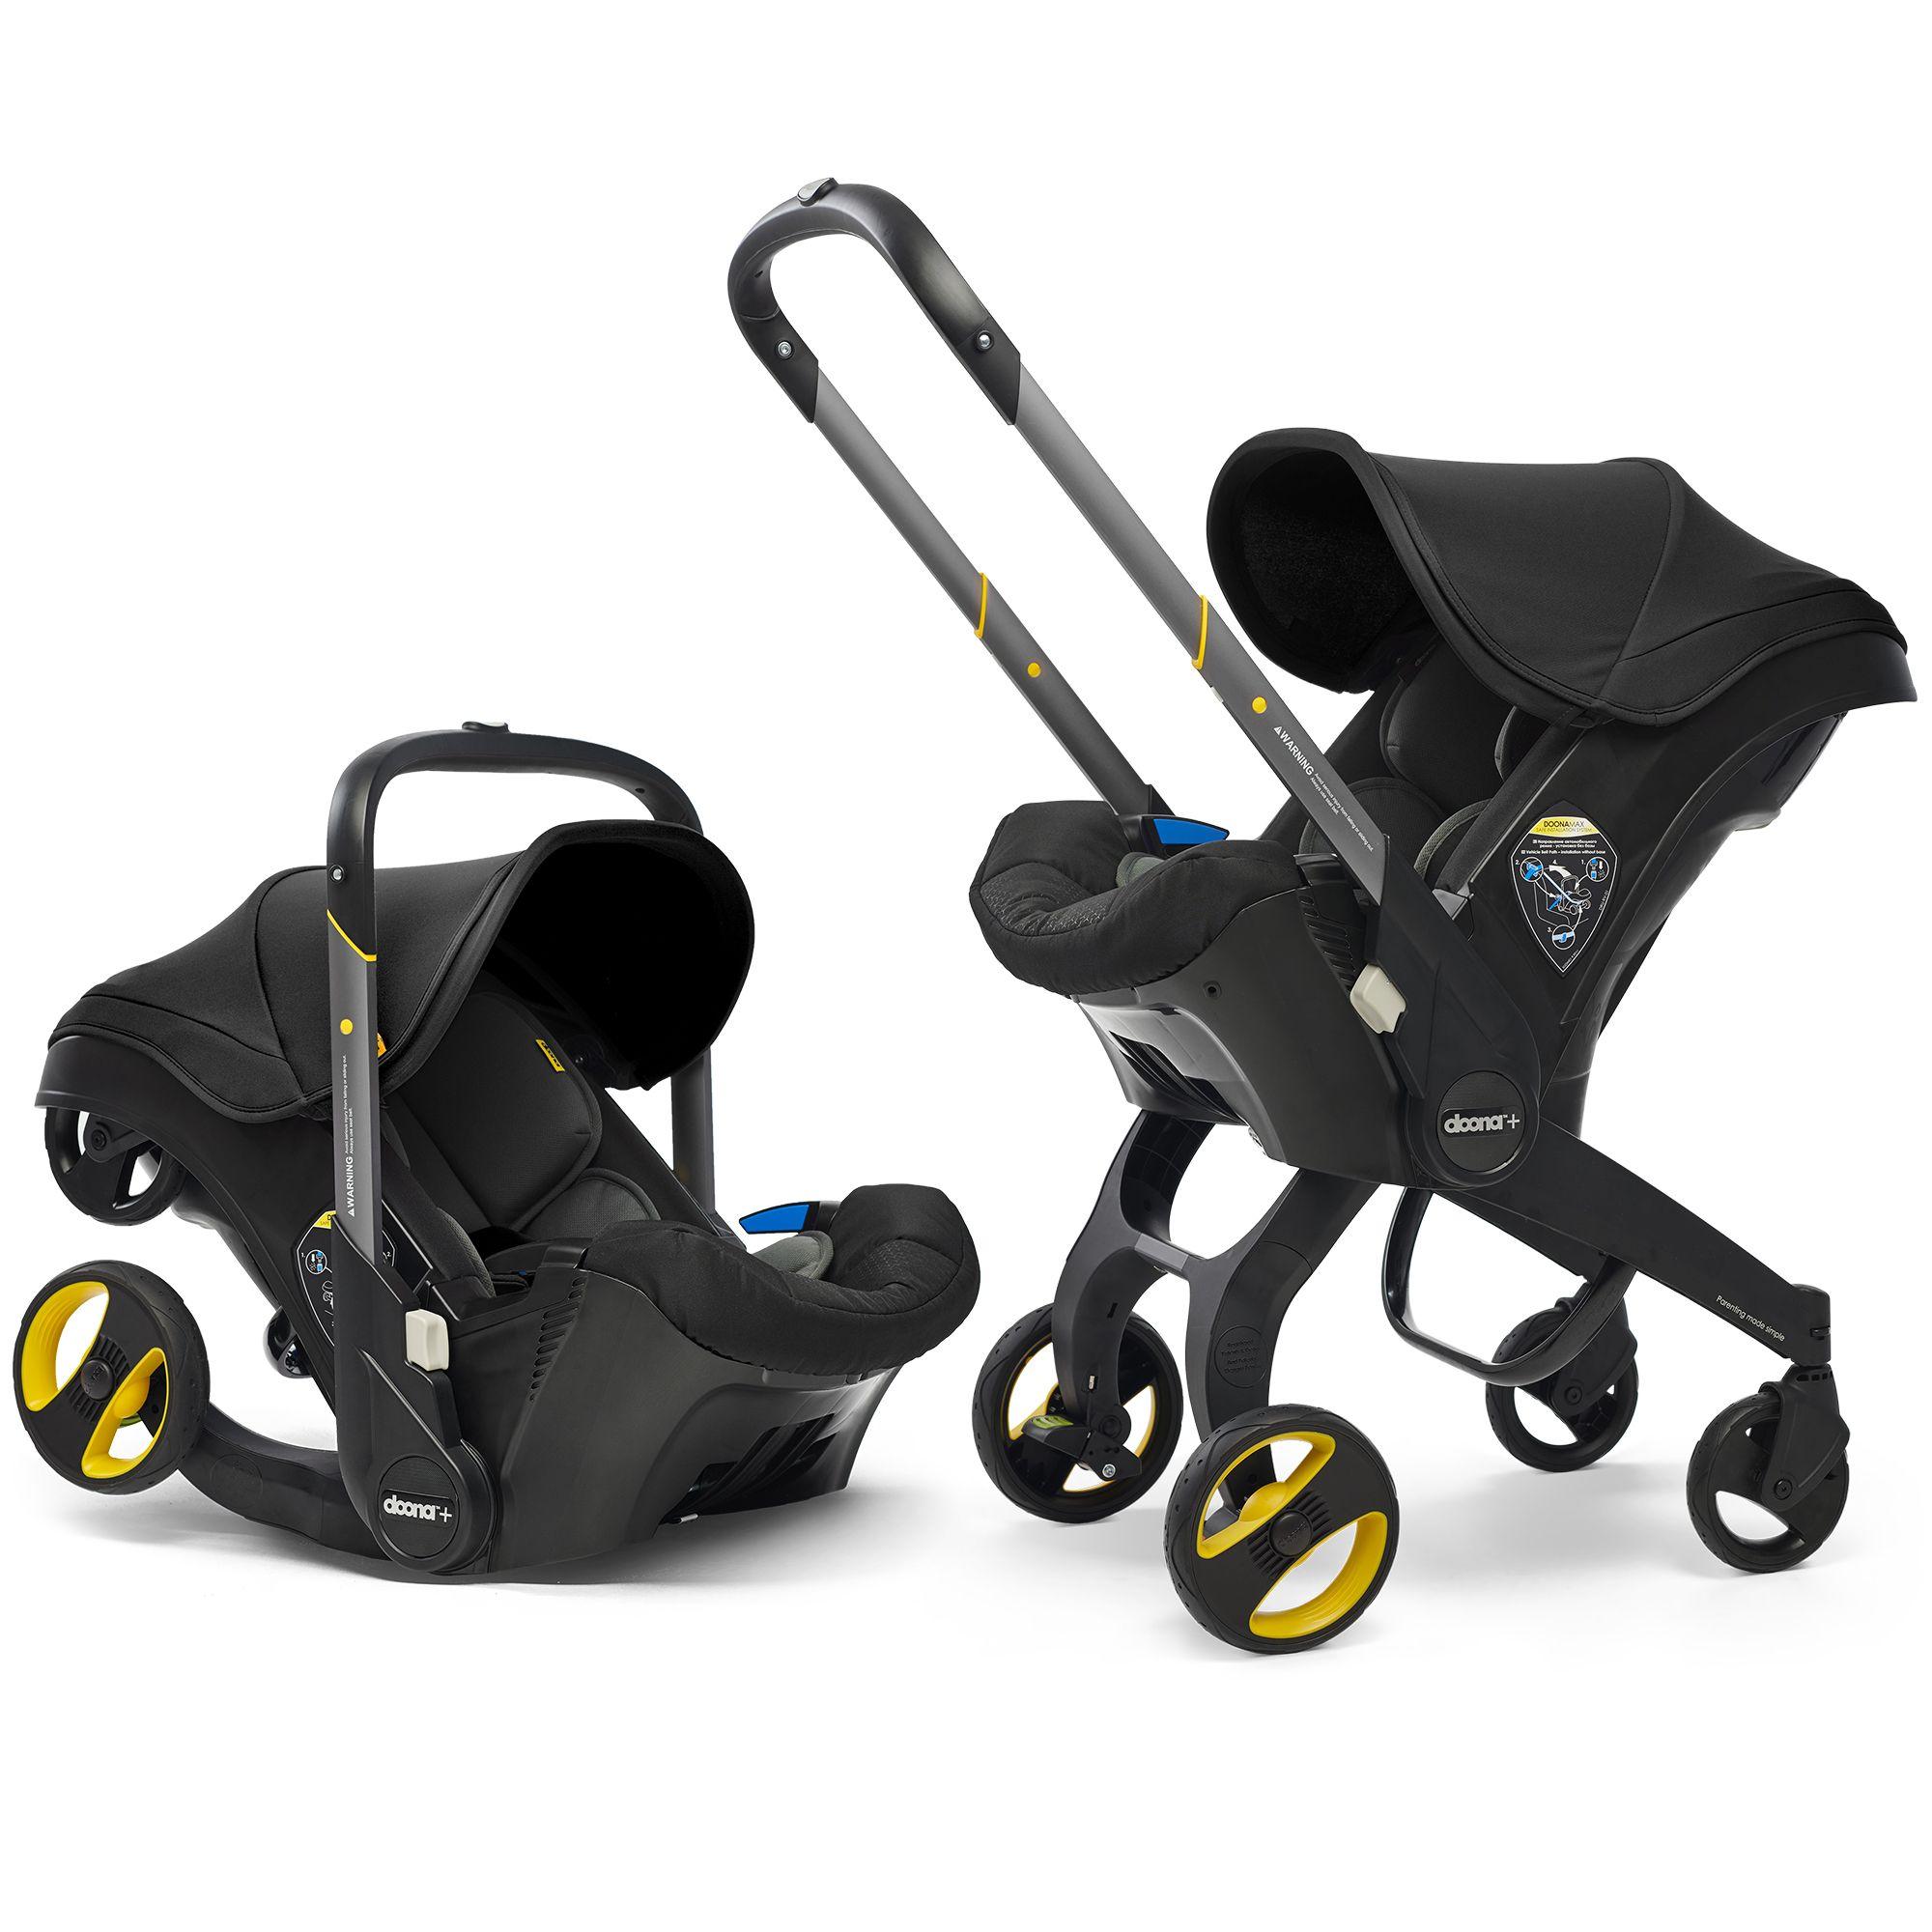 chic momfashion carseat stroller Baby car seats